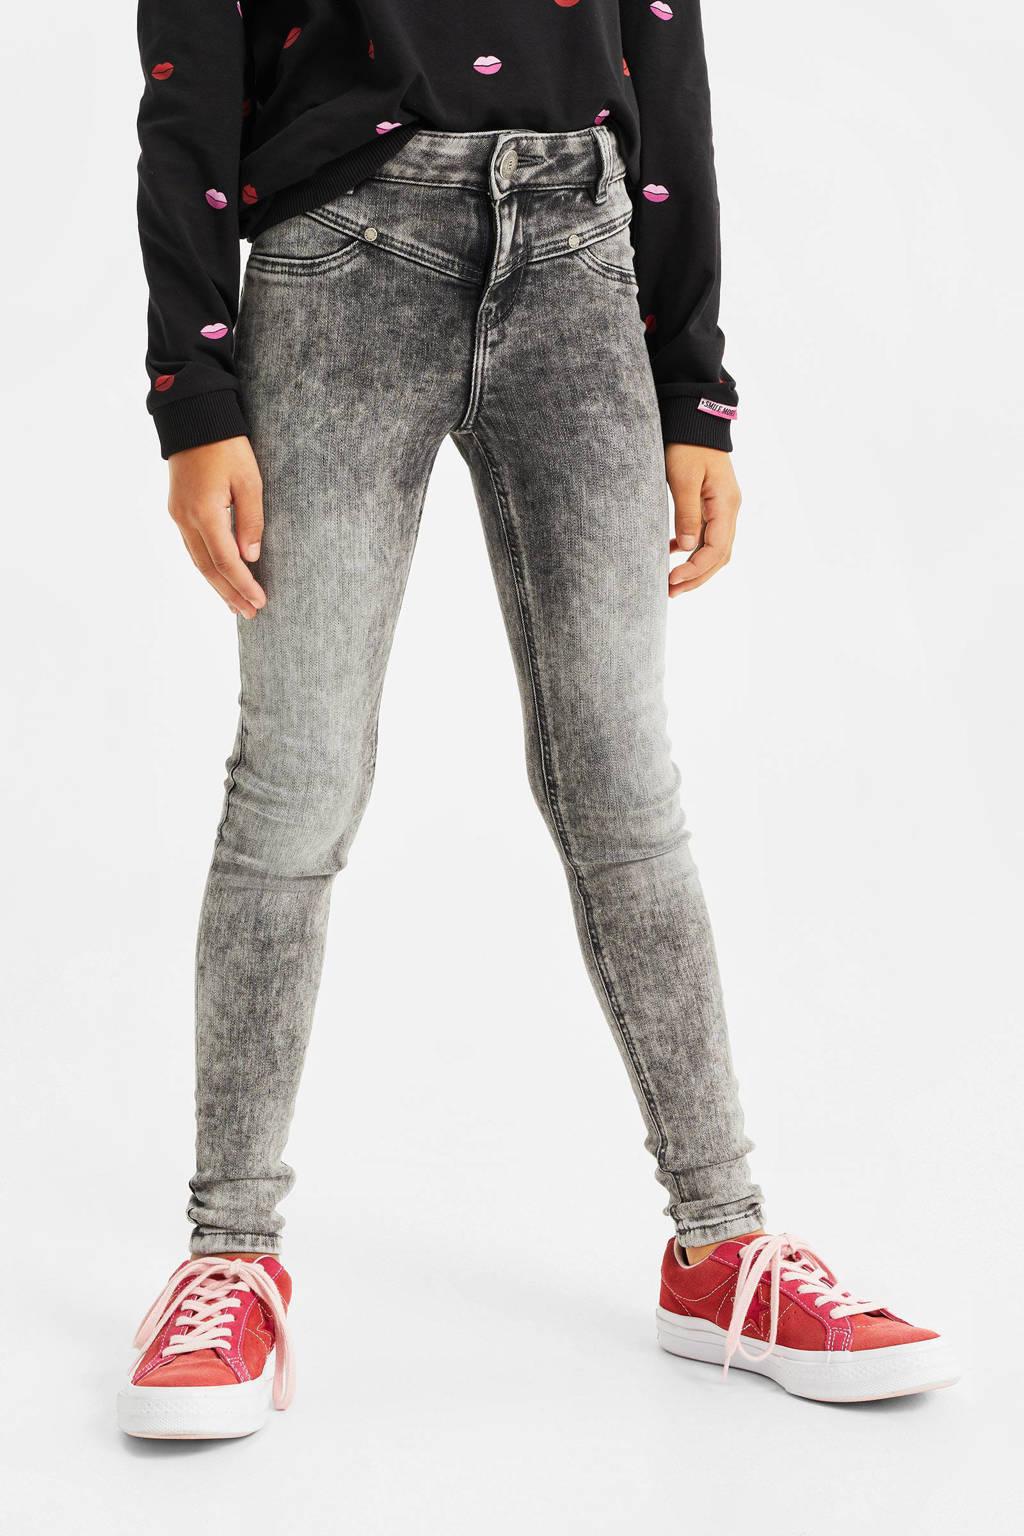 WE Fashion Blue Ridge super skinny jeans grijs stonewashed, Grijs stonewashed